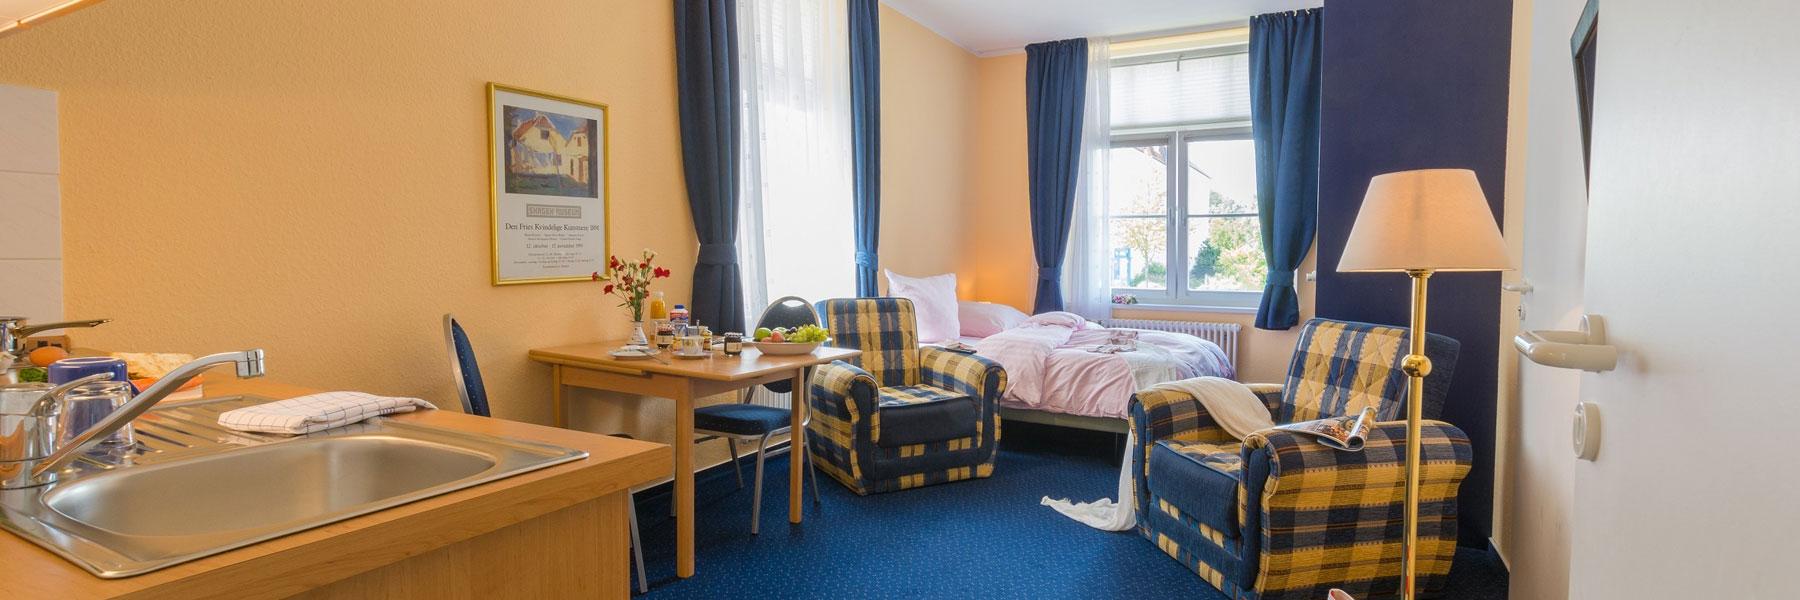 "1-Raum-Apartment - Apartmenthaus ""Villa Norden"""